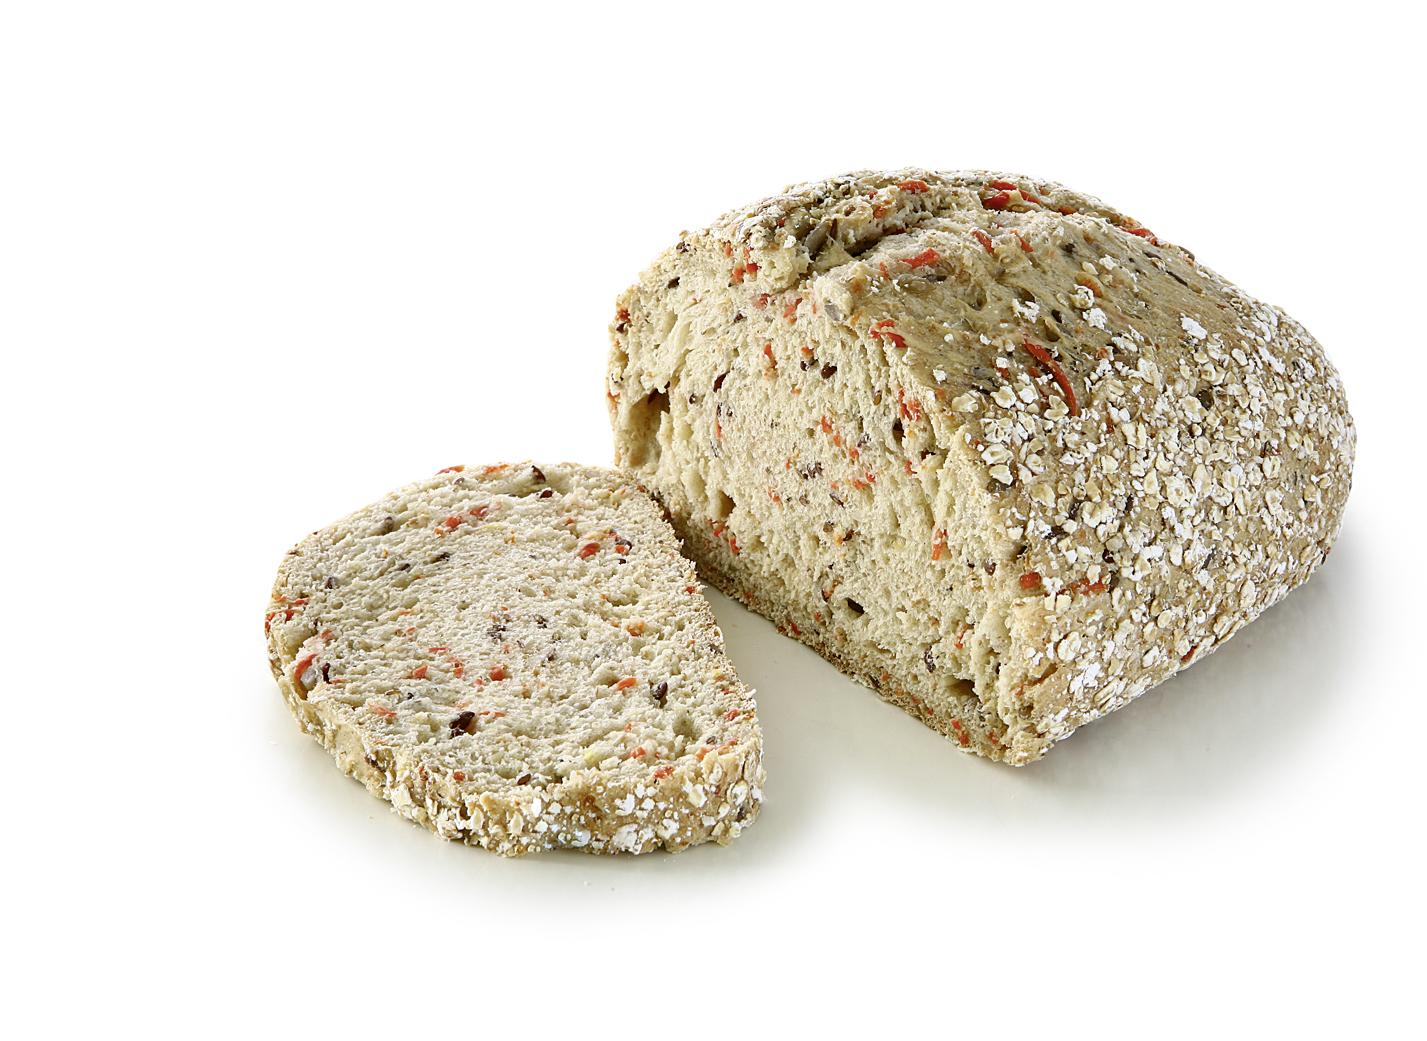 Carrot Multi Grain Bread - Wheat bread with 6% sweet potatoes, potato flakes and rye flour/ lentgh: 27cm